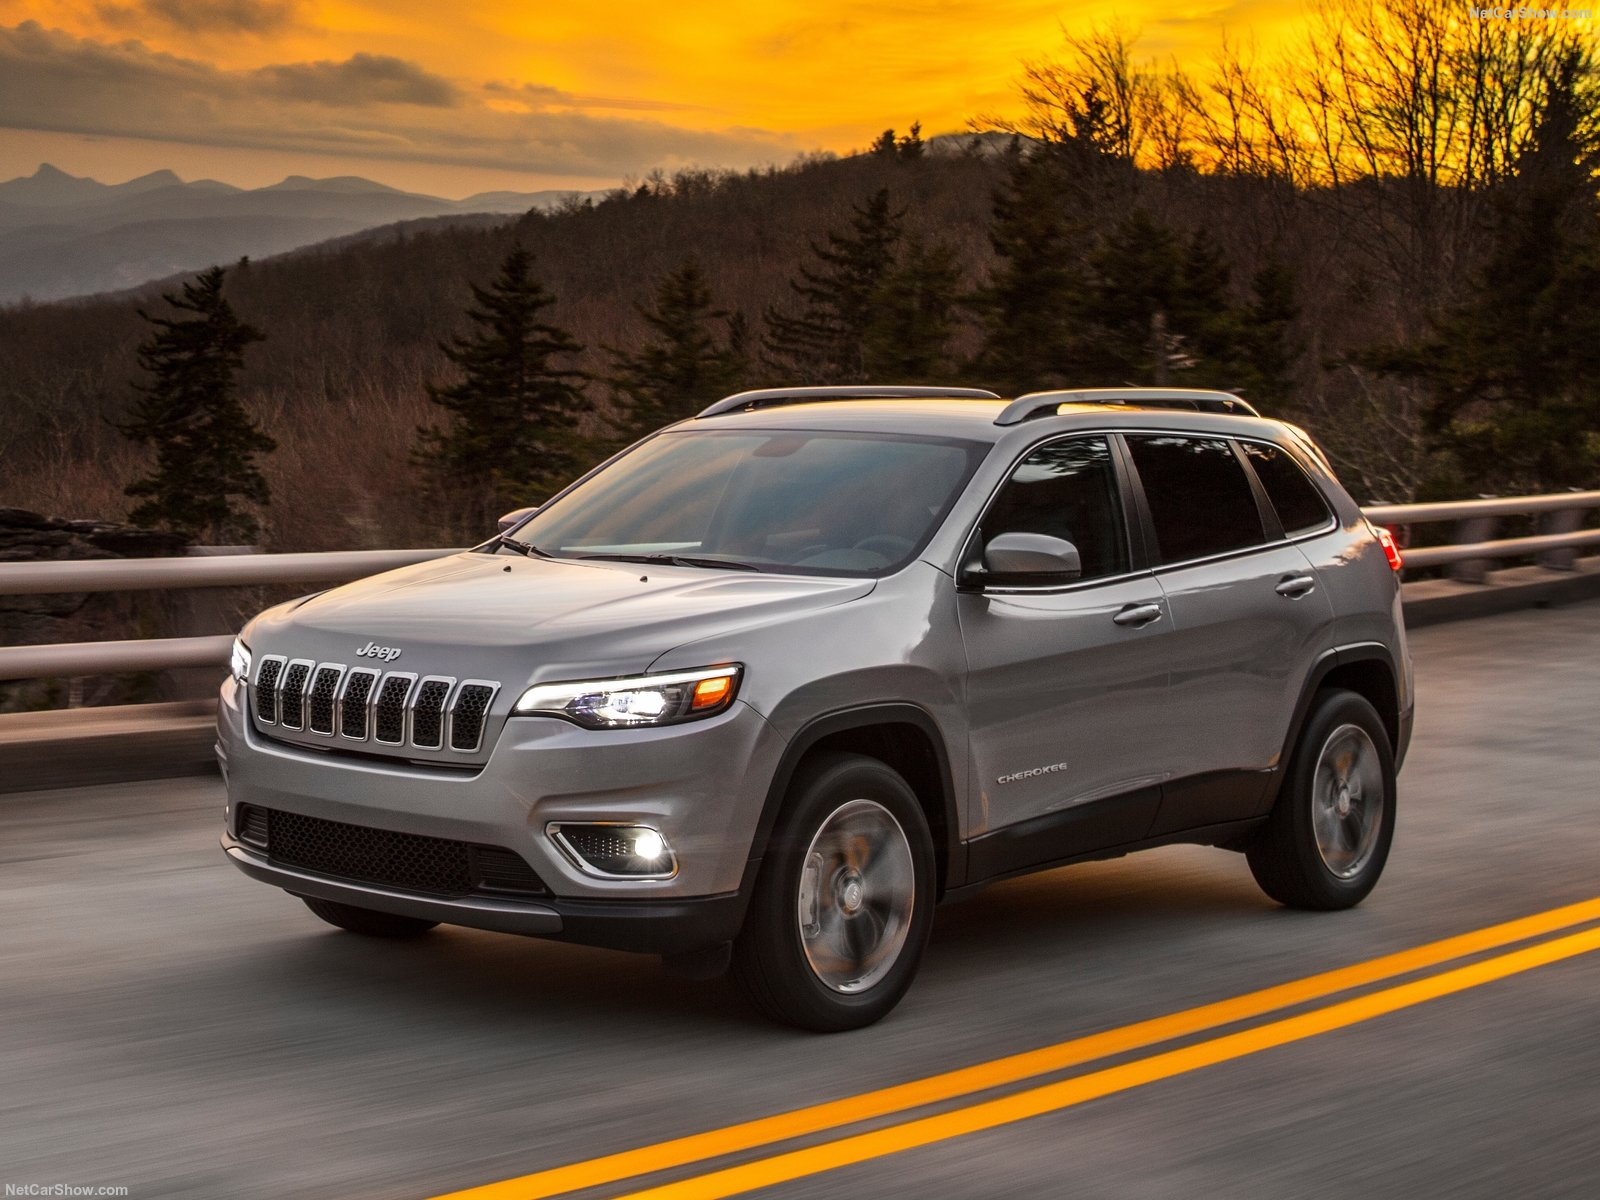 Jeep-Cherokee-2019-1600-02.jpg